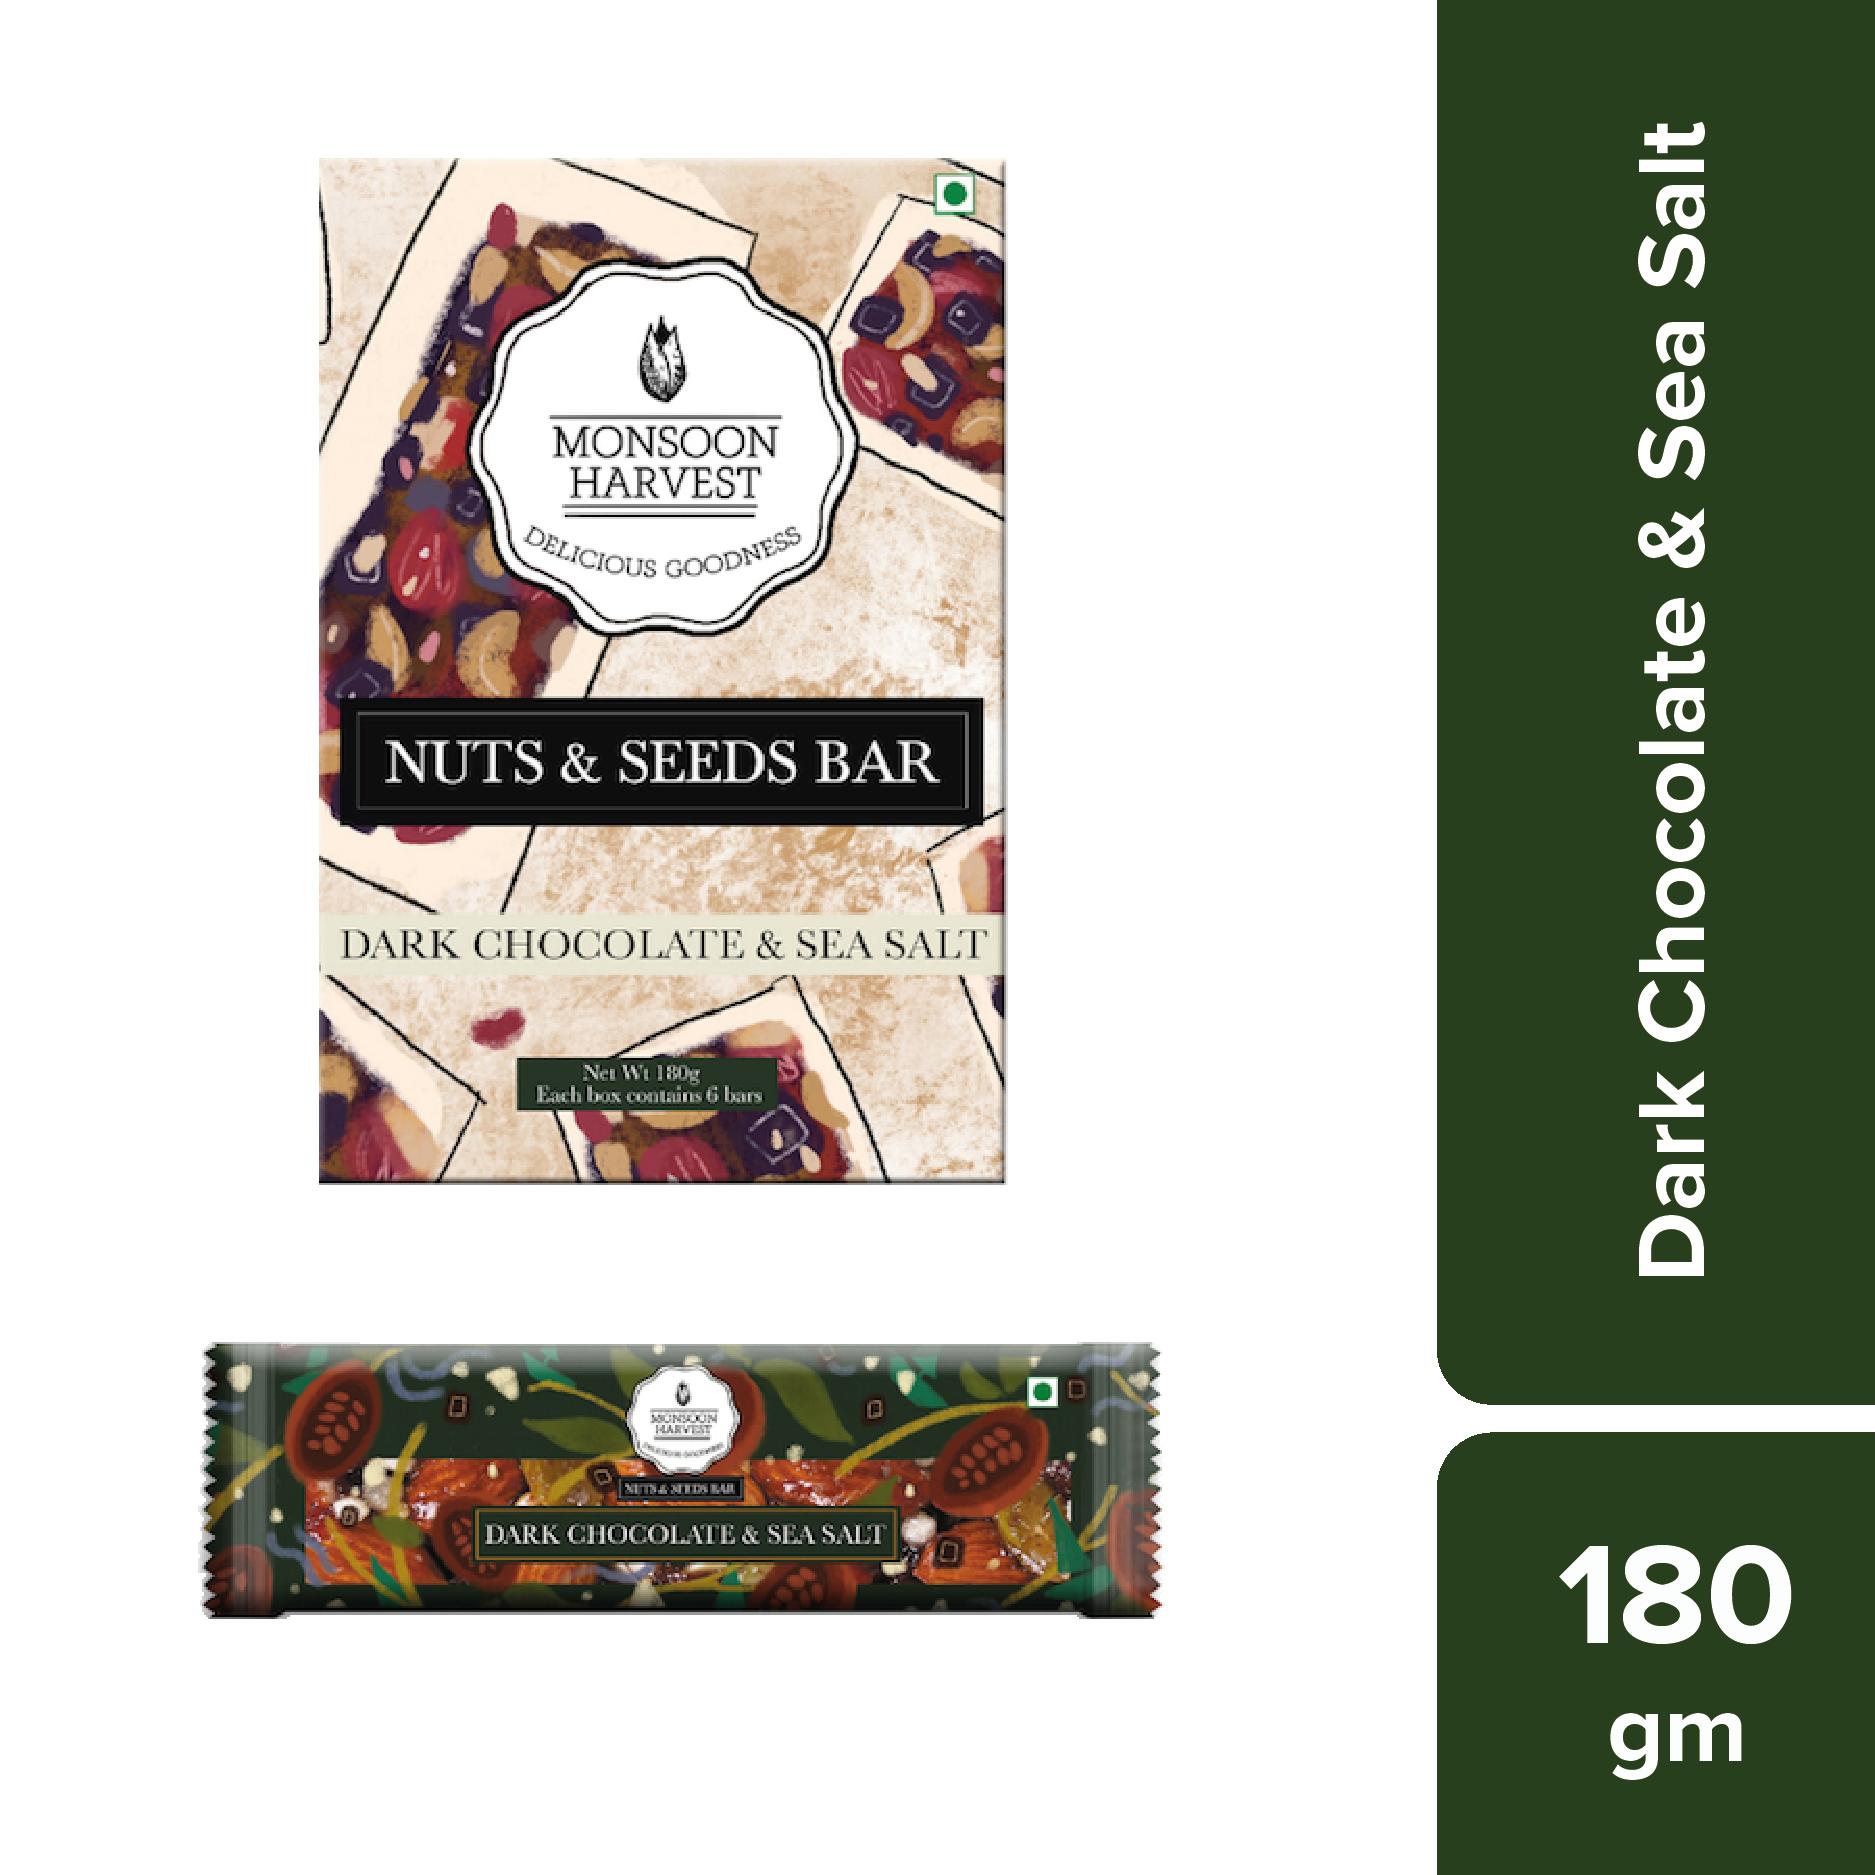 Nuts & Seeds Bars - Dark Chocolate & Sea Salt (Pack of 6)